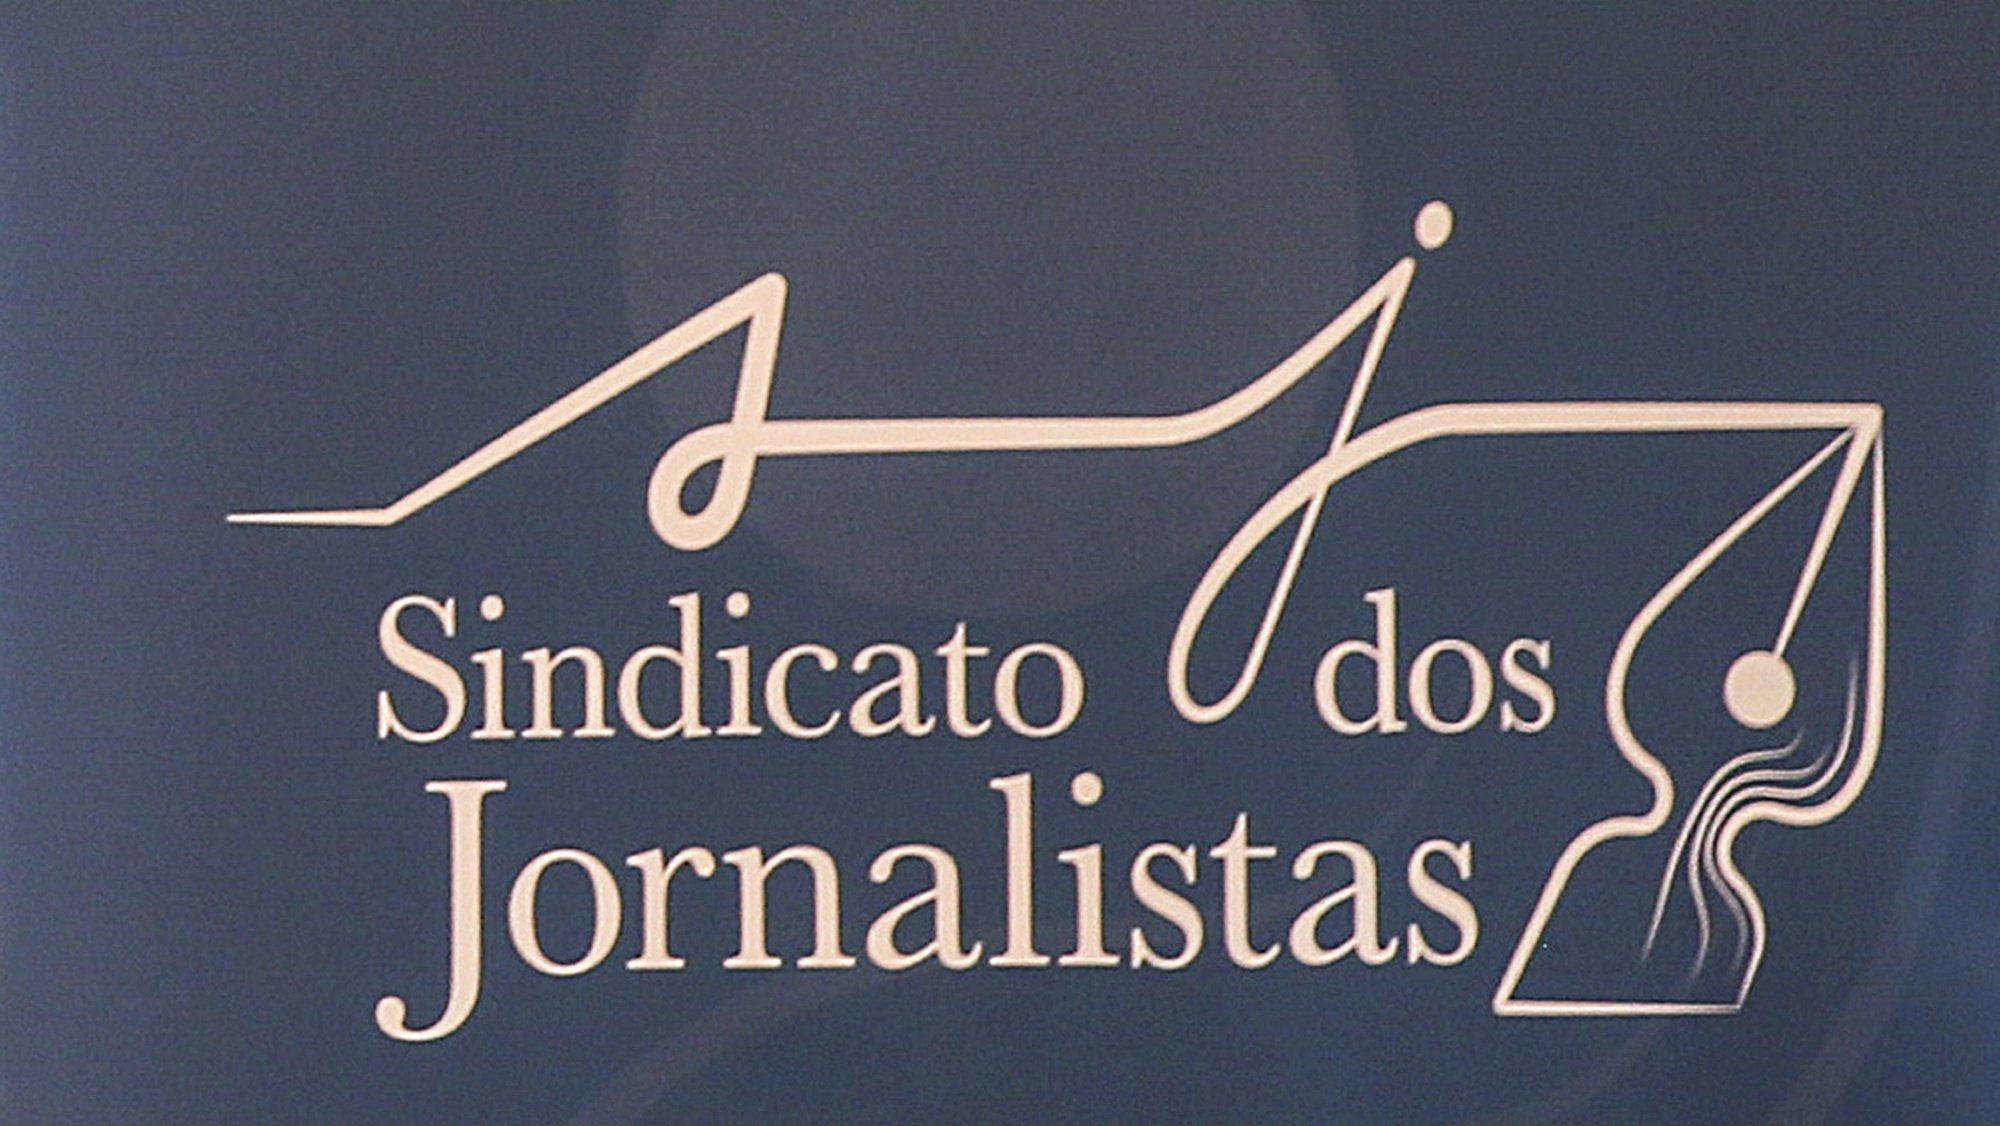 Sindicato dos Jornalistas, 2 de dezembro de 2019.  MANUEL DE ALMEIDA/LUSA